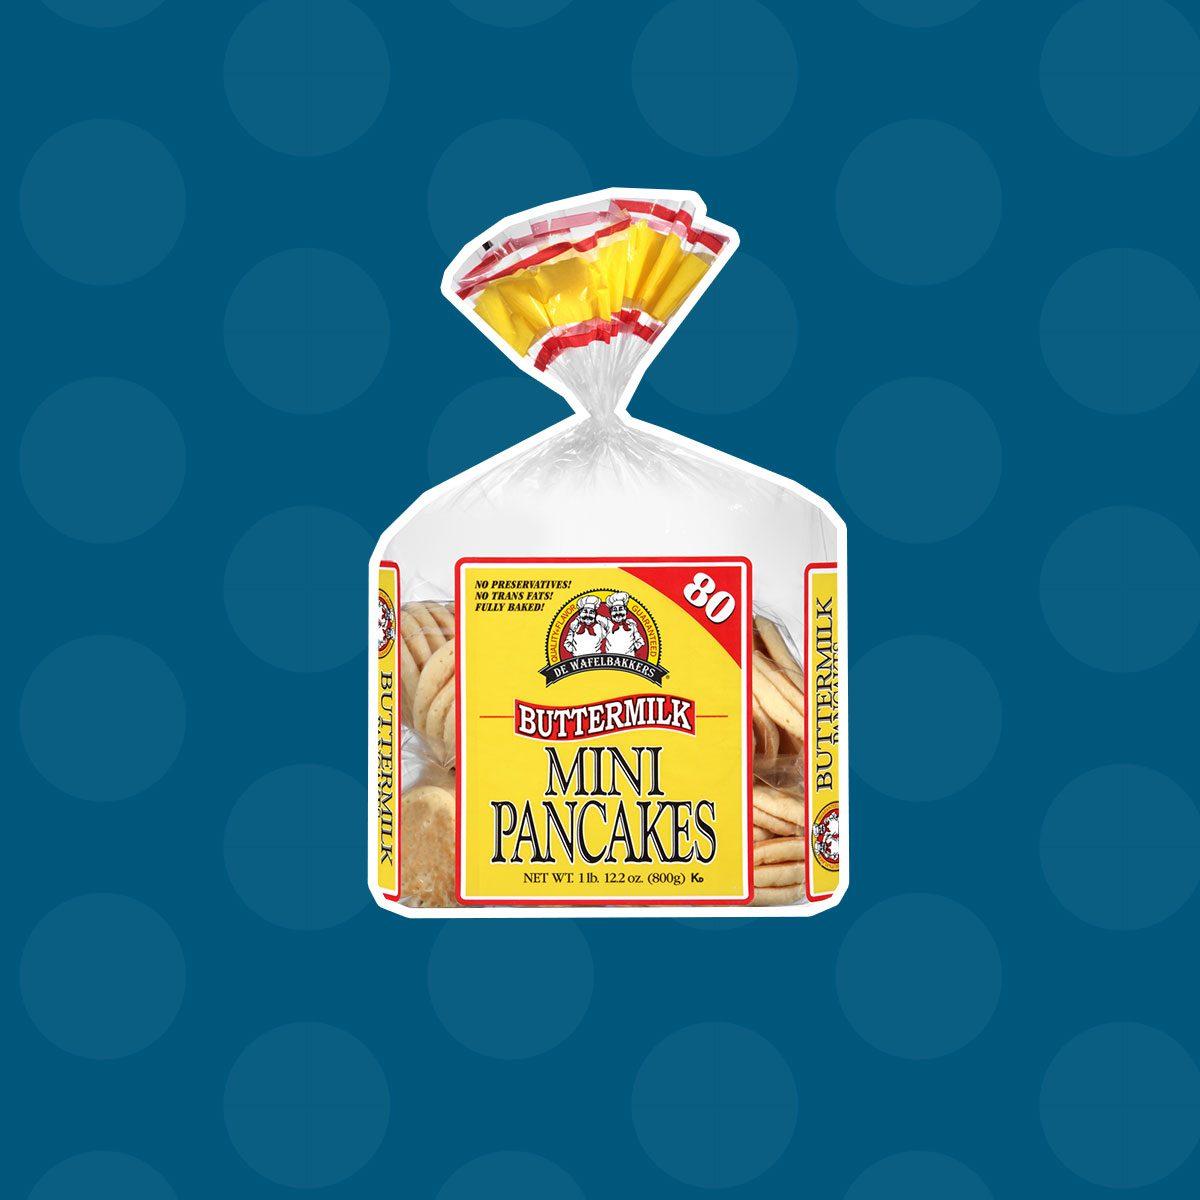 Buttermilk Mini Pancakes